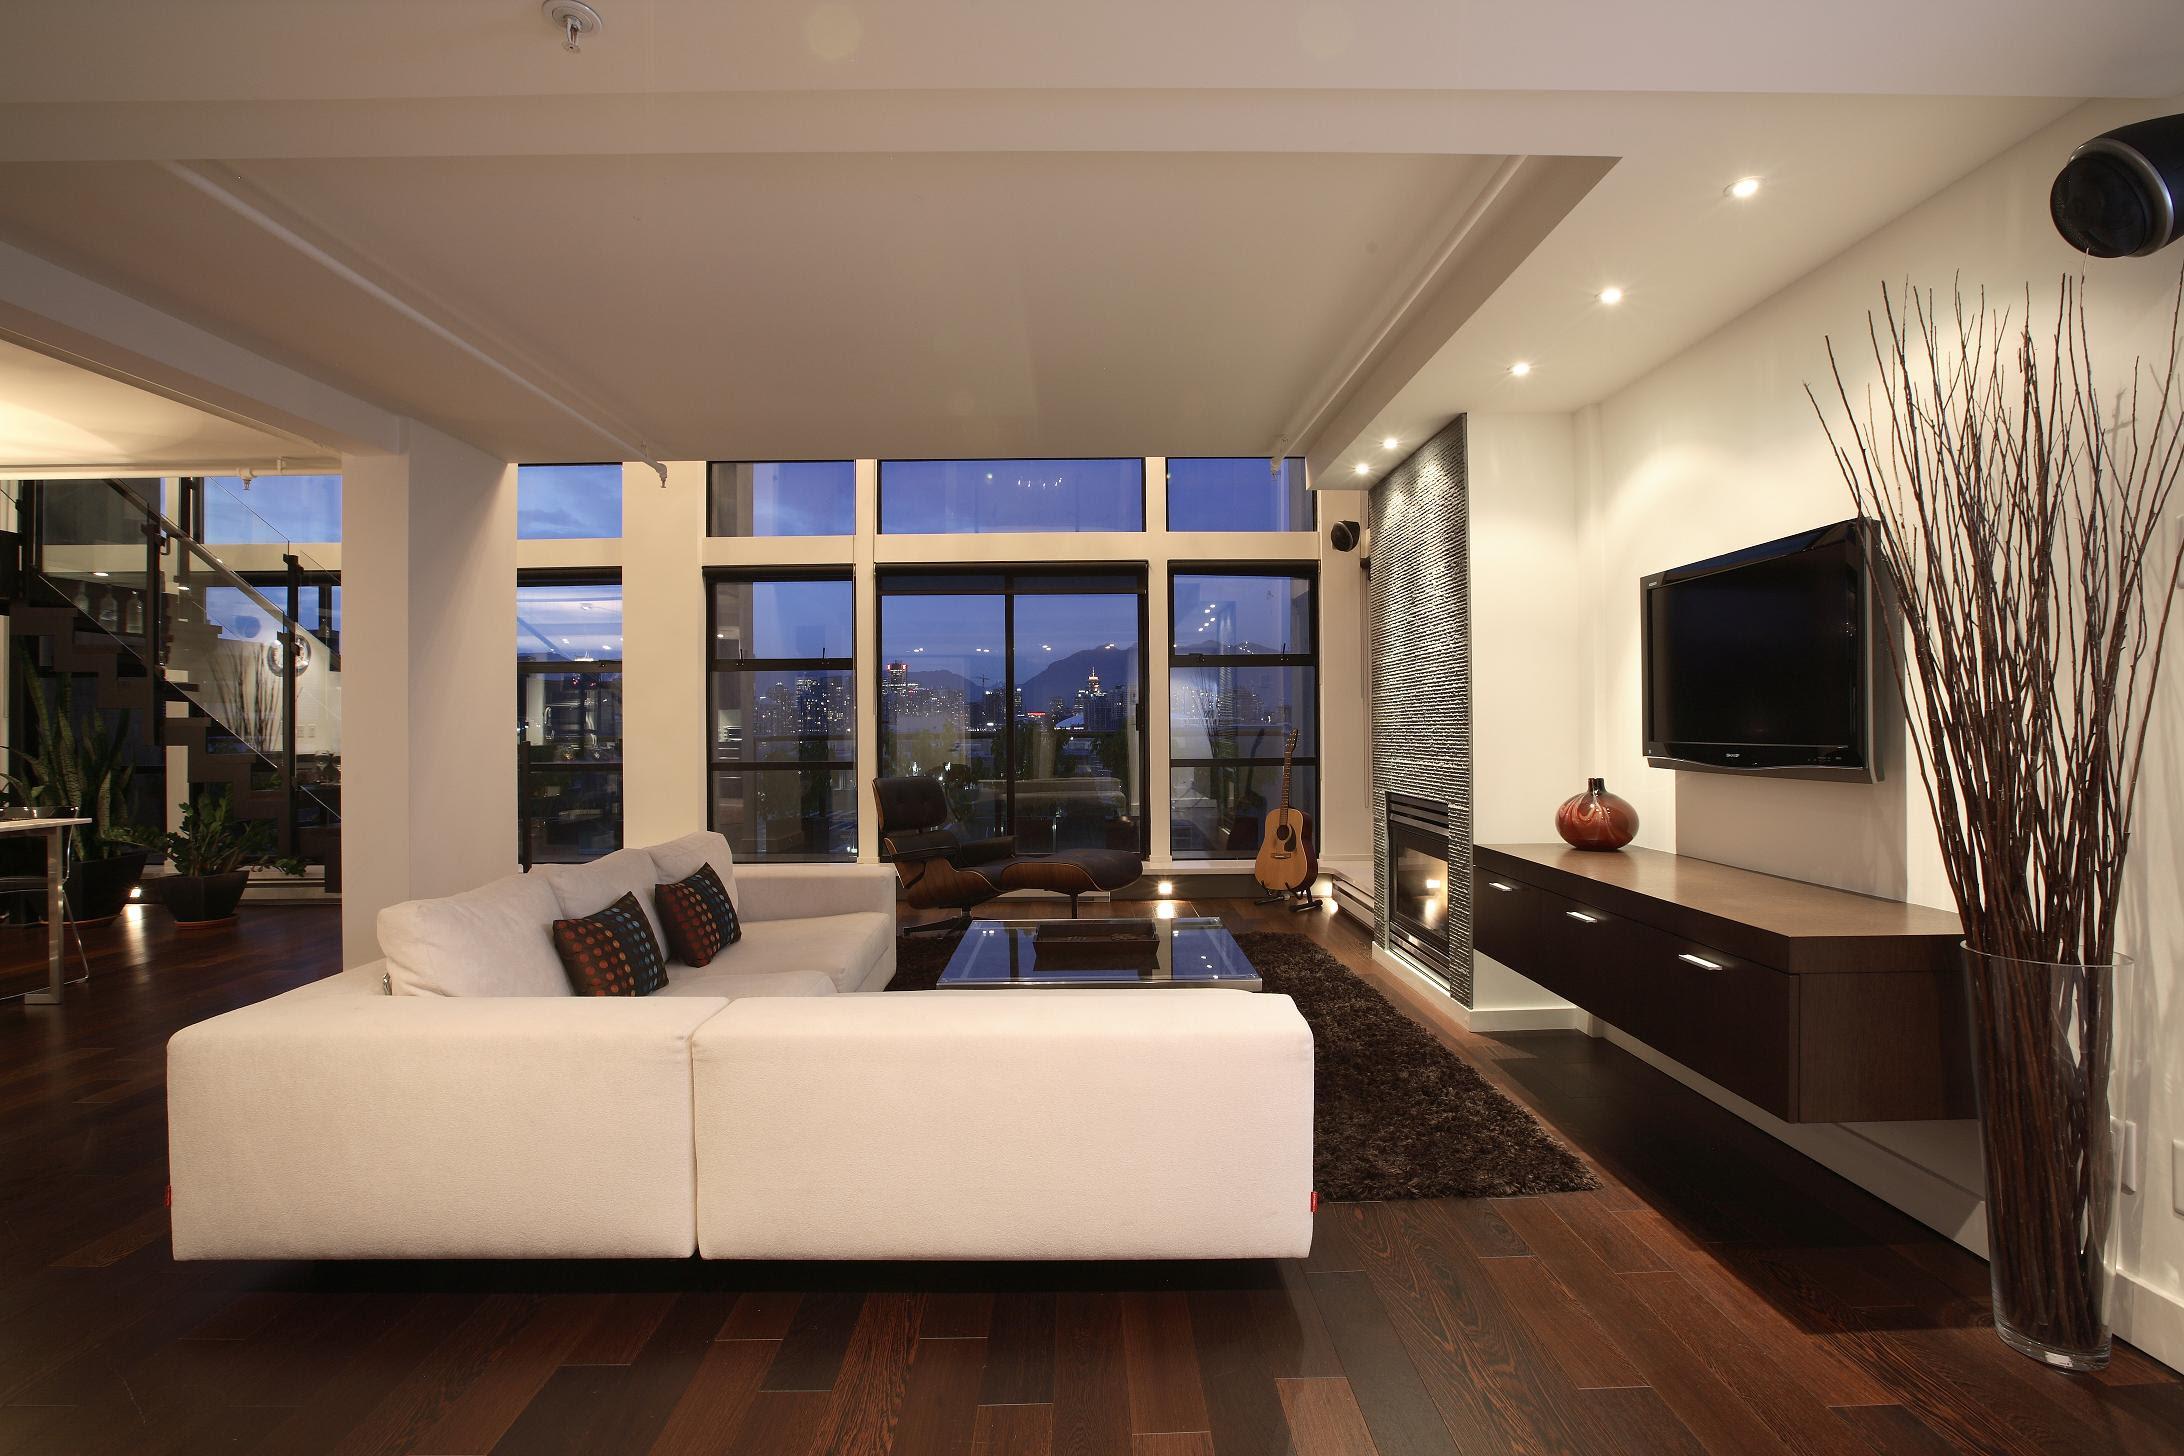 Modern Apartment Interior Design - HomesFeed